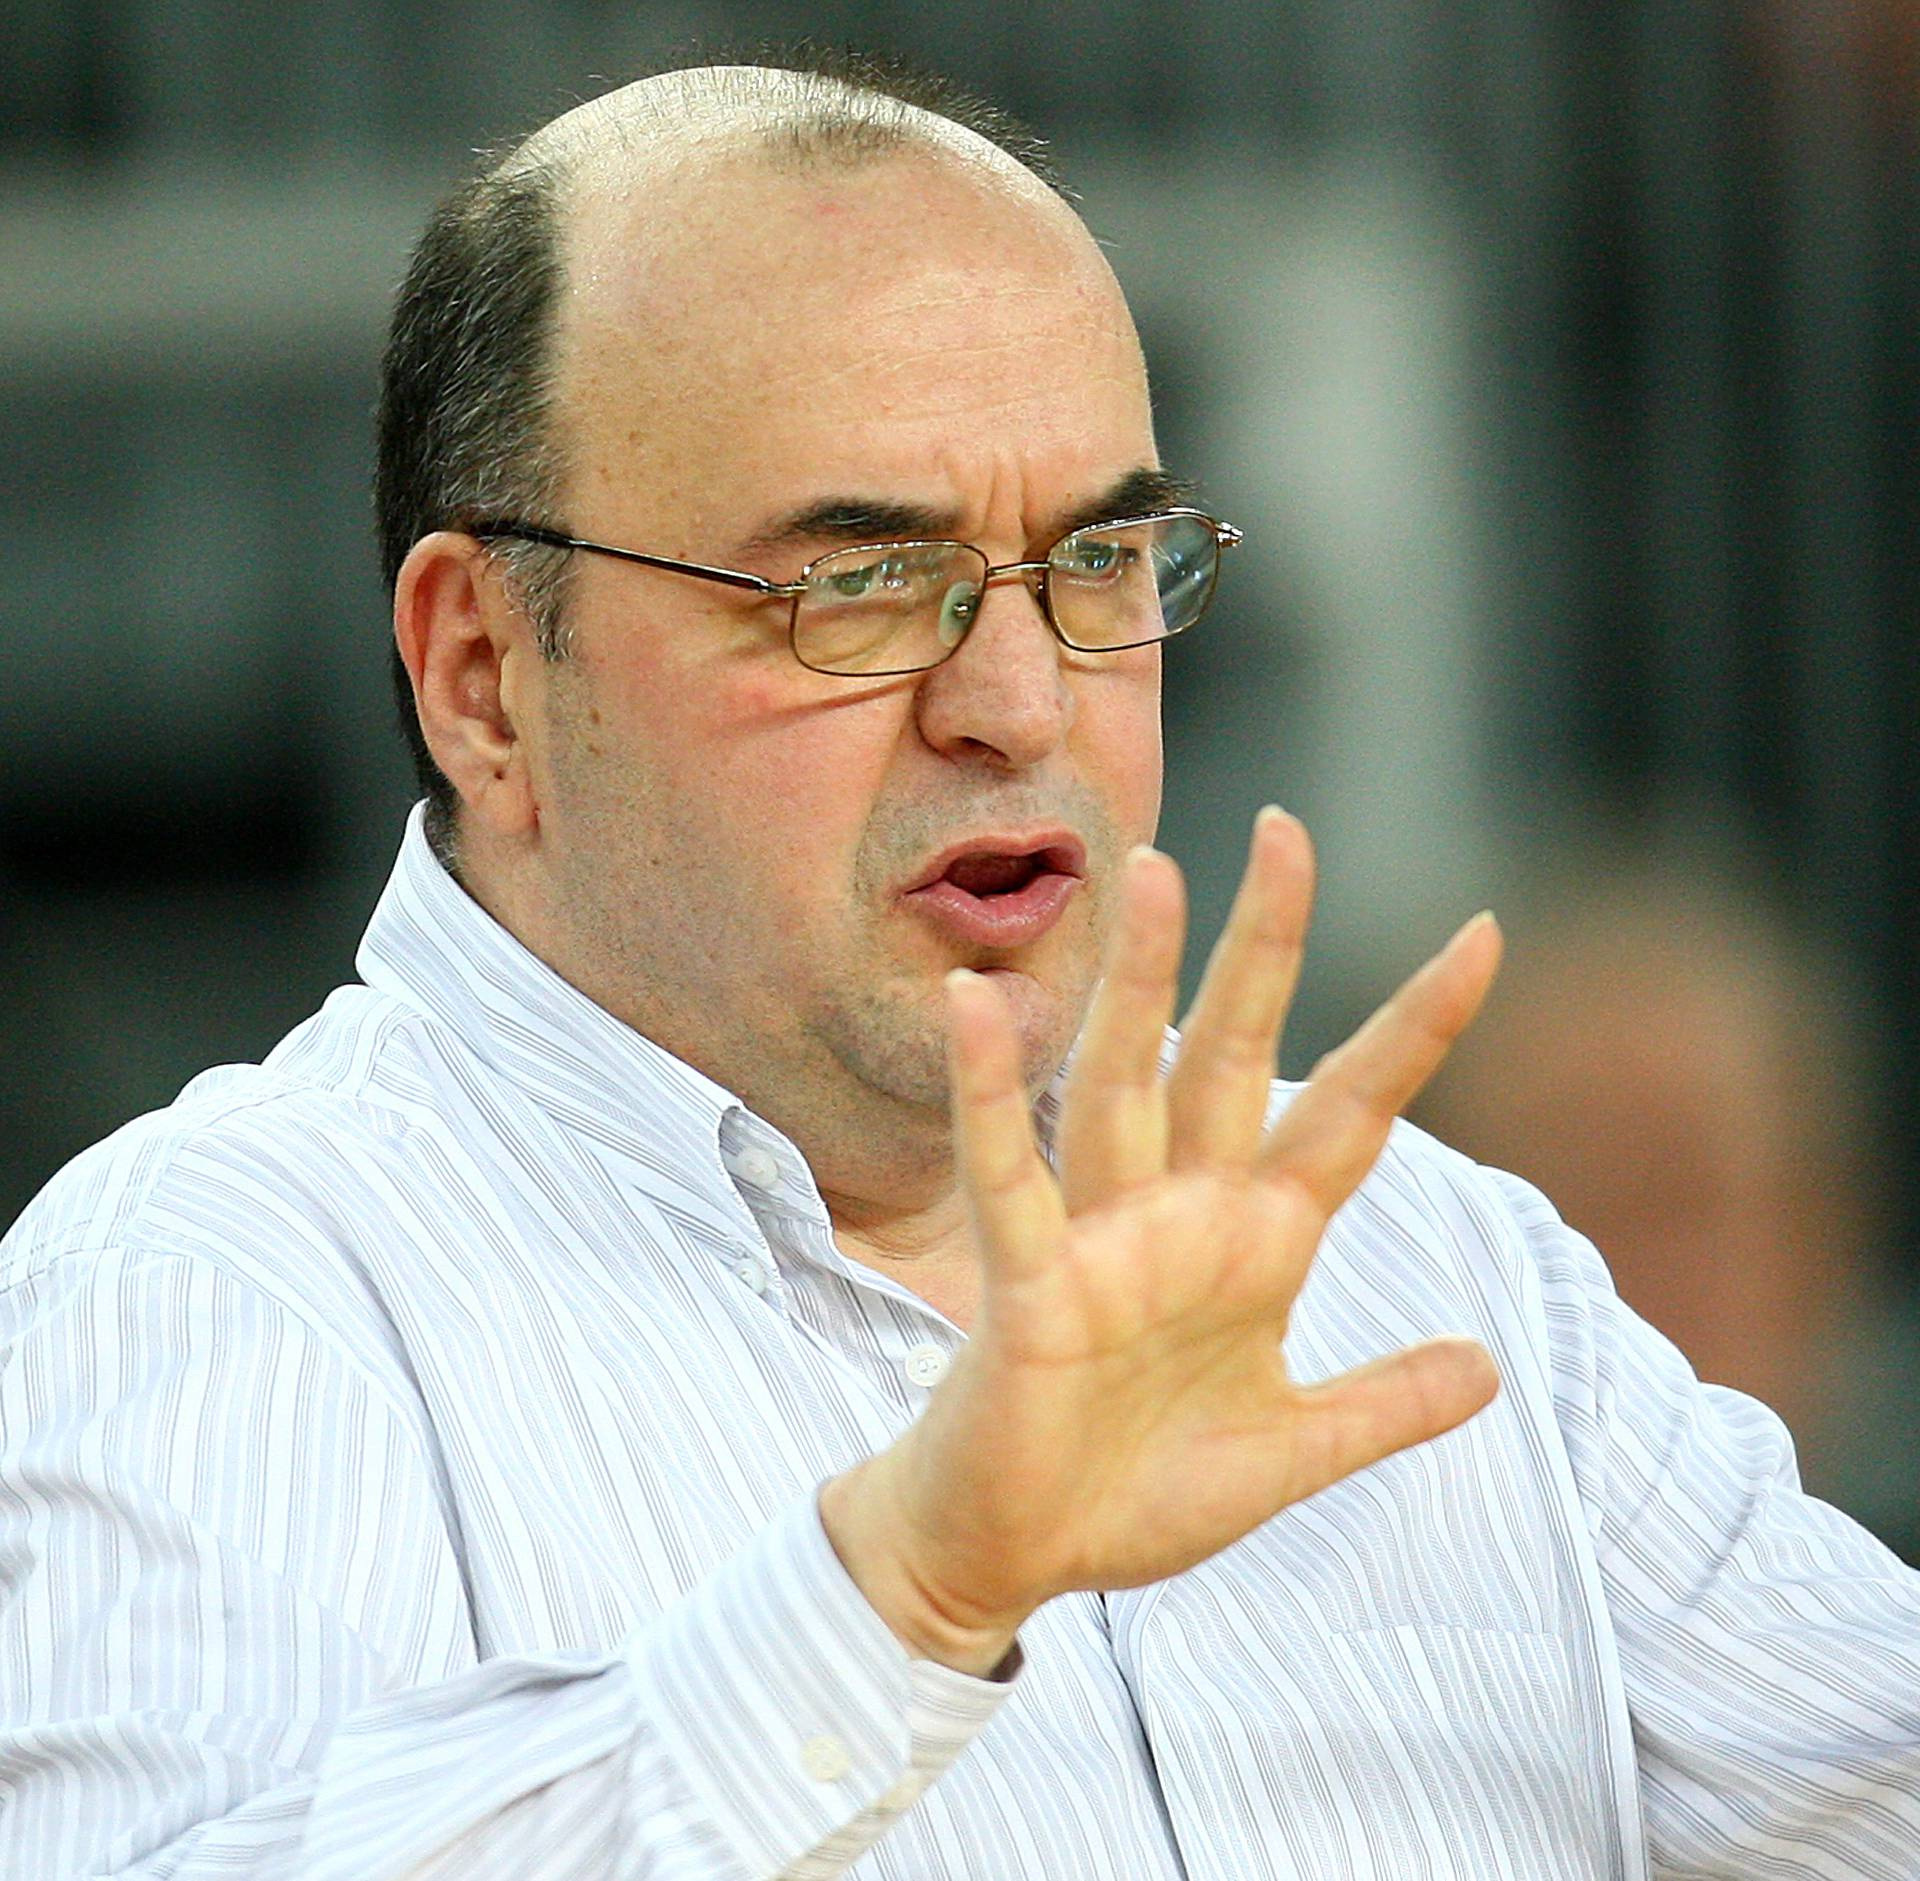 Legendarni košarkaški trener: Srbija je najveći krivac za rat